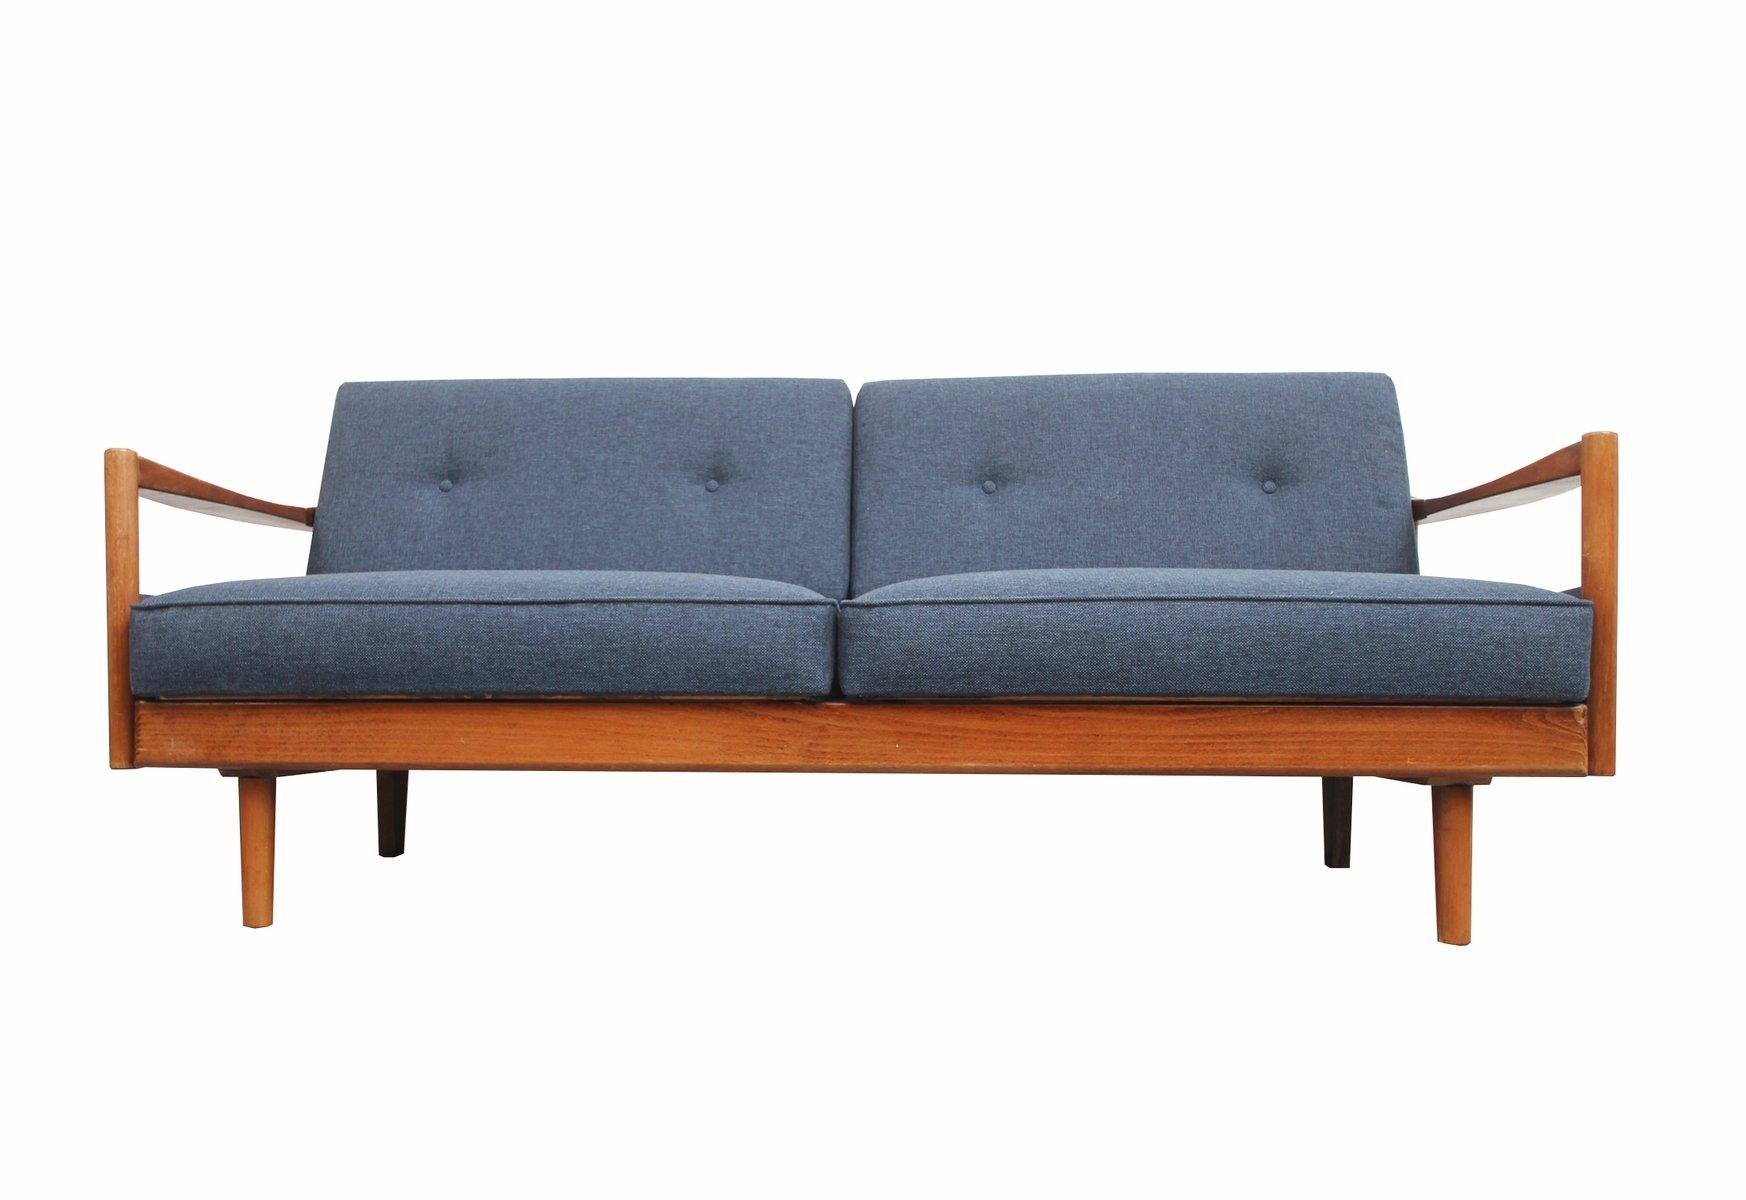 German Blue 2 Seater Sofa, 1960S